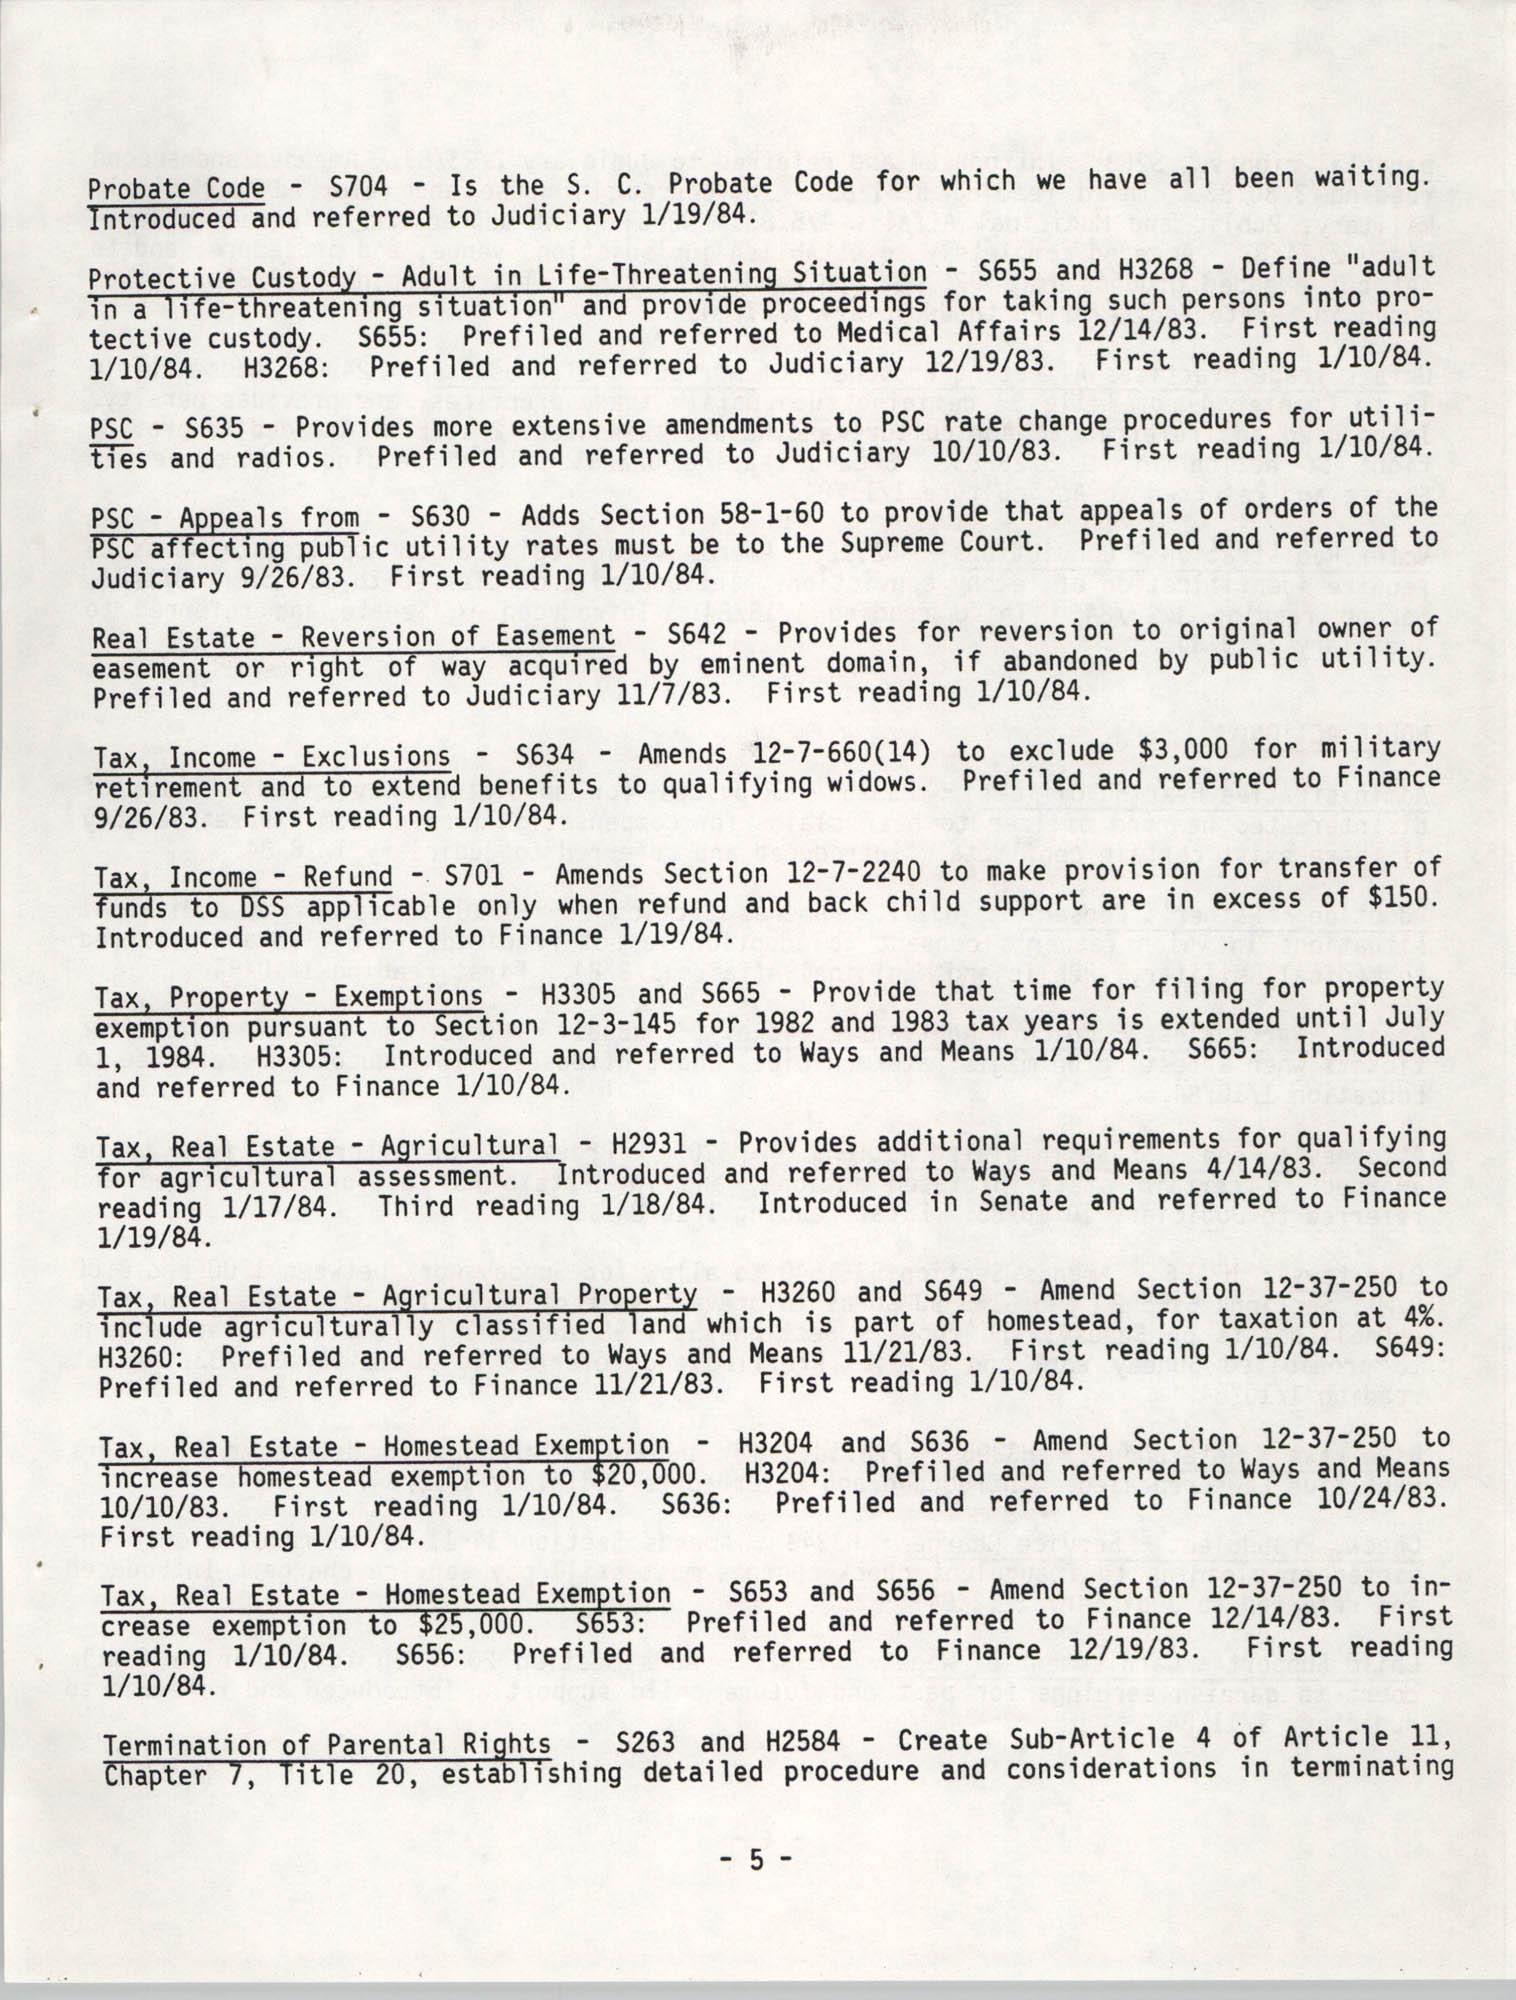 South Carolina Bar Legislative Roundup, Vol. 6 No. 1, January 26, 1984, Page 5